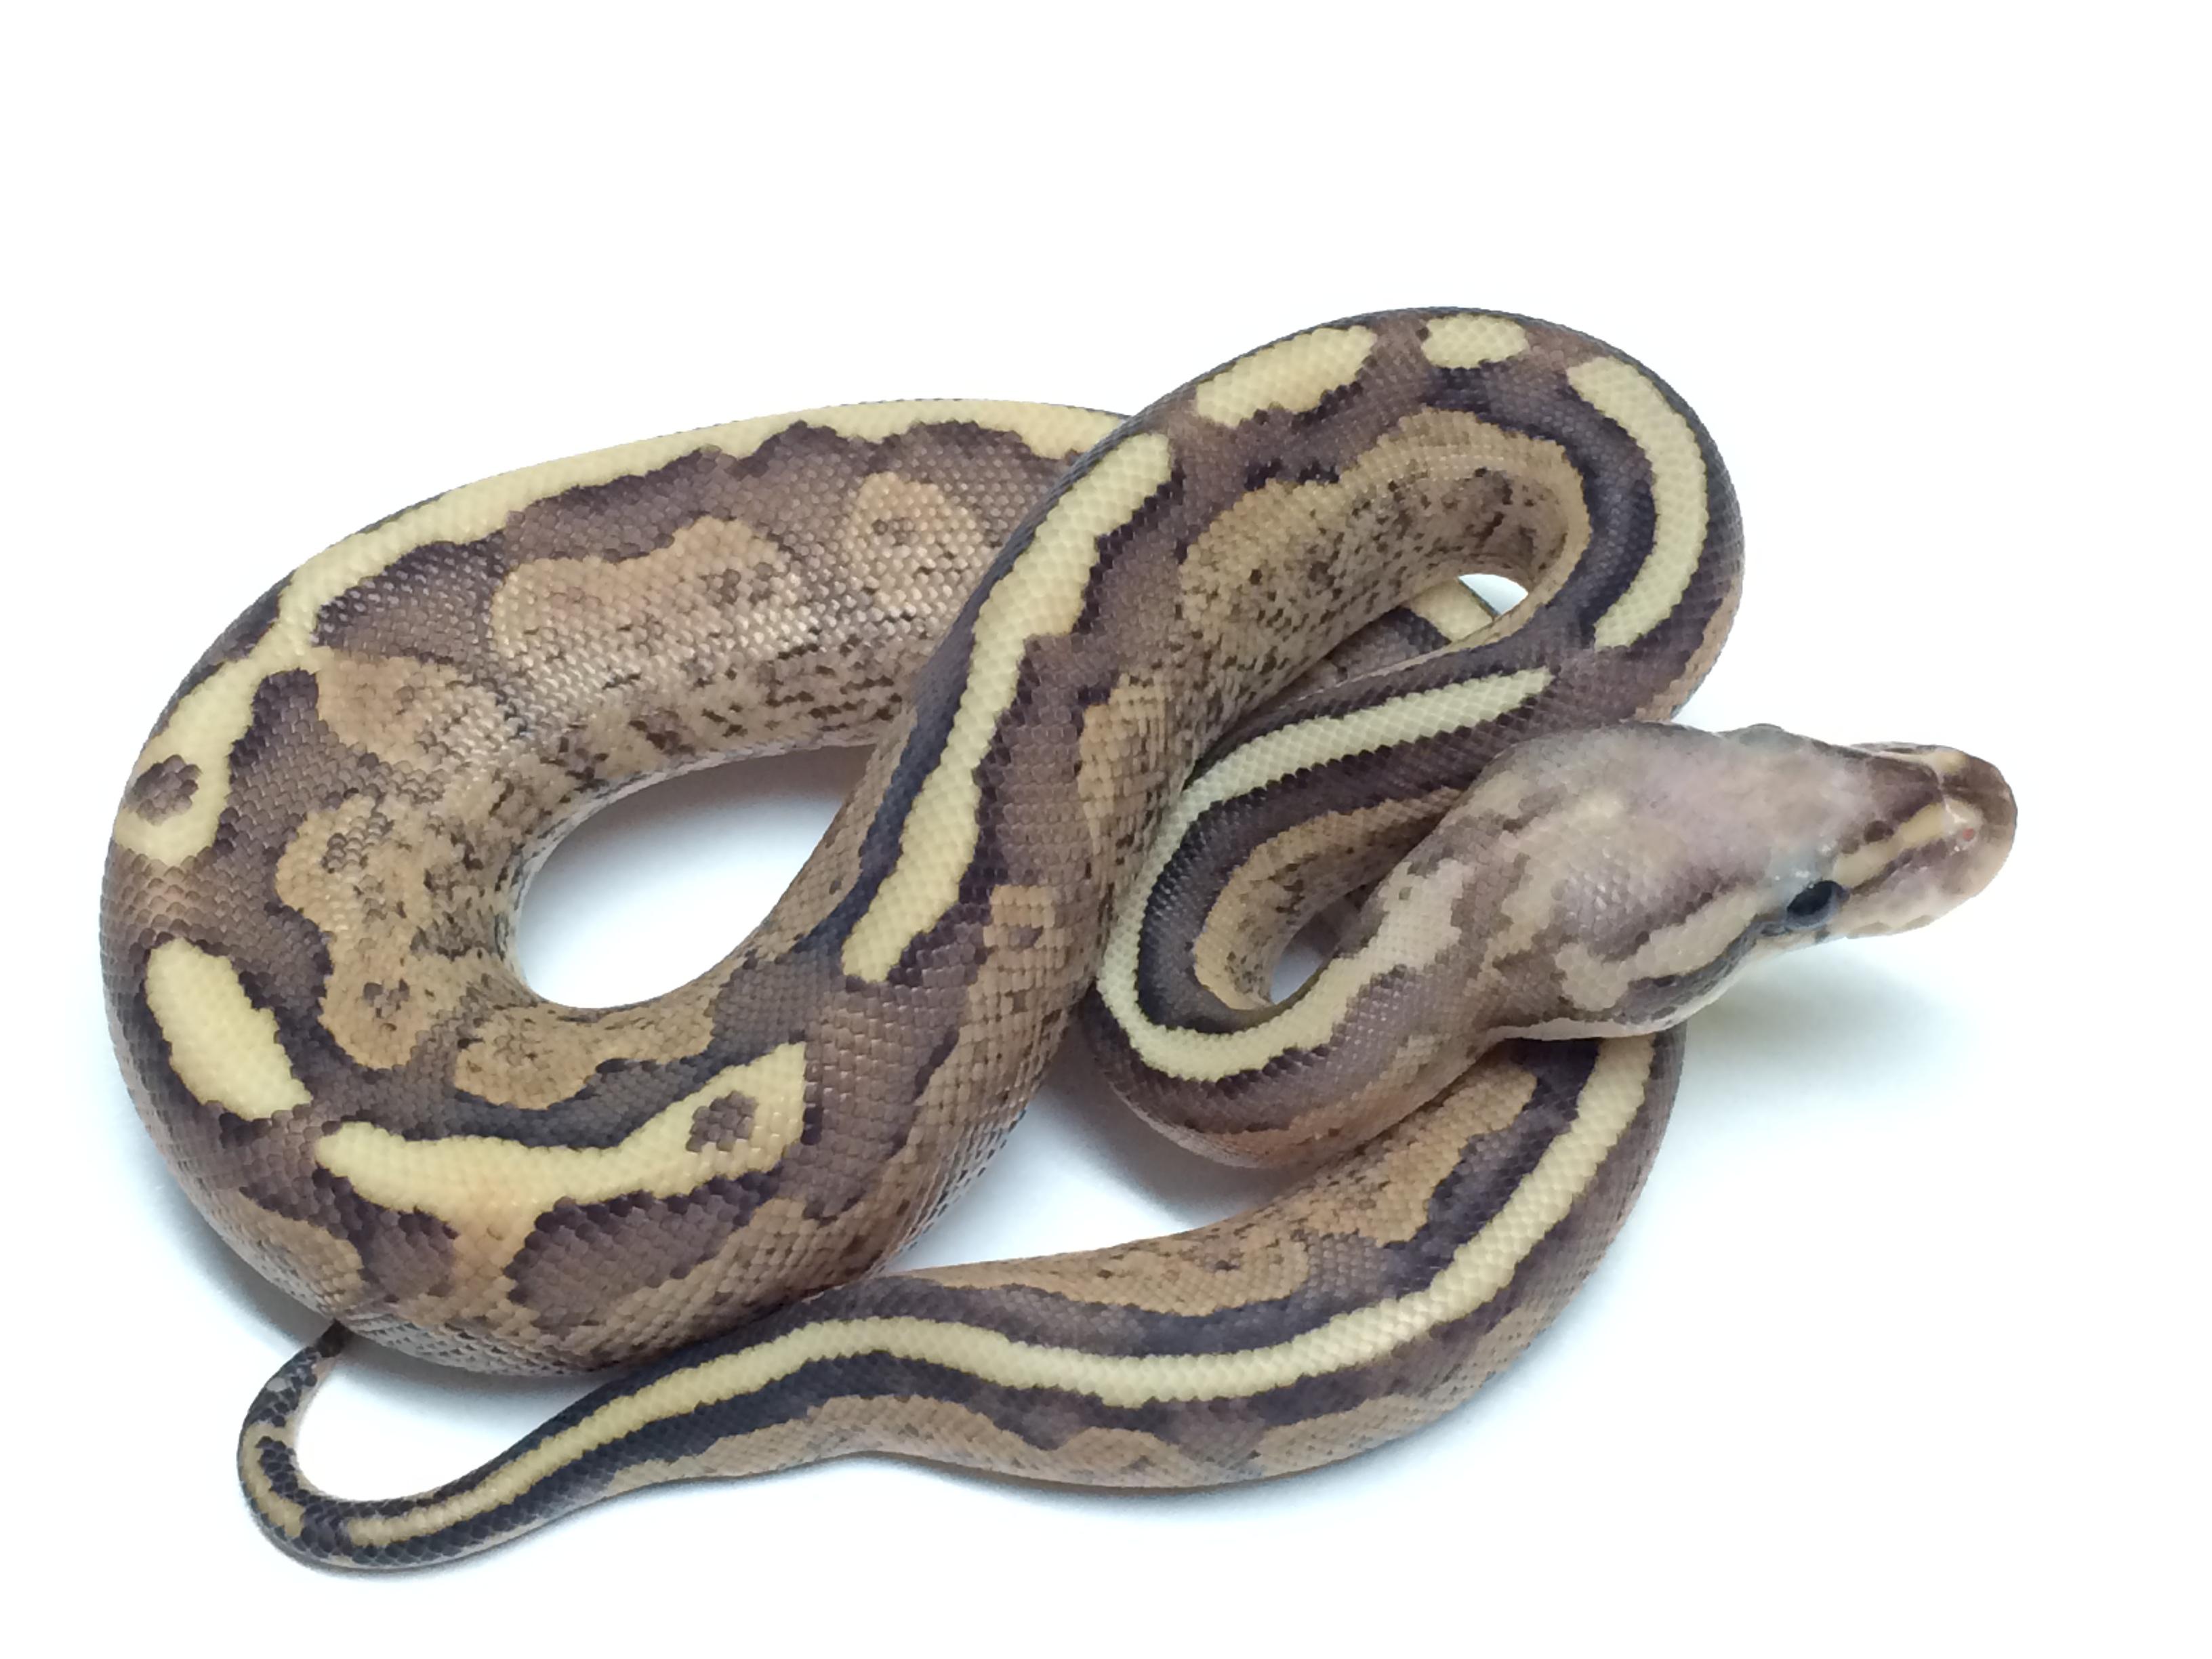 Baby Cinnamon Amoretti Ball Python